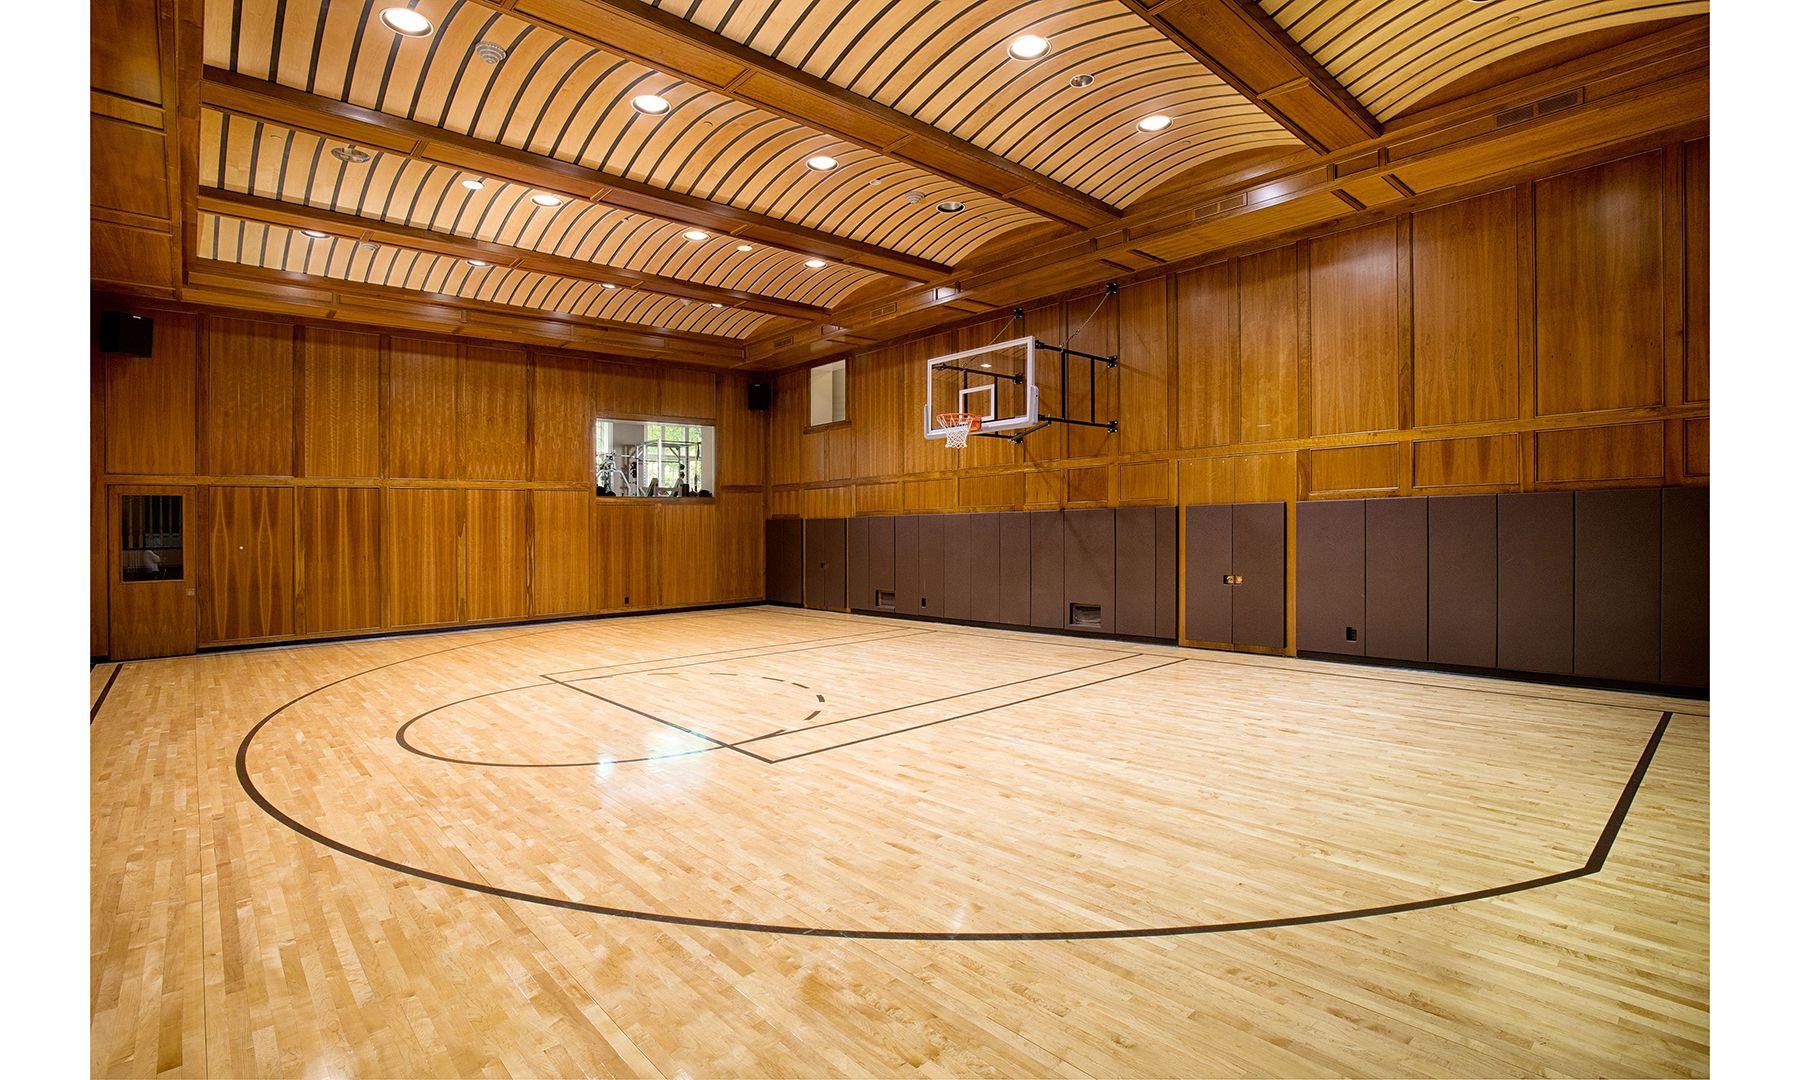 Conyers Farm Estate Dujour Basketball Court Flooring Home Basketball Court Basketball Court